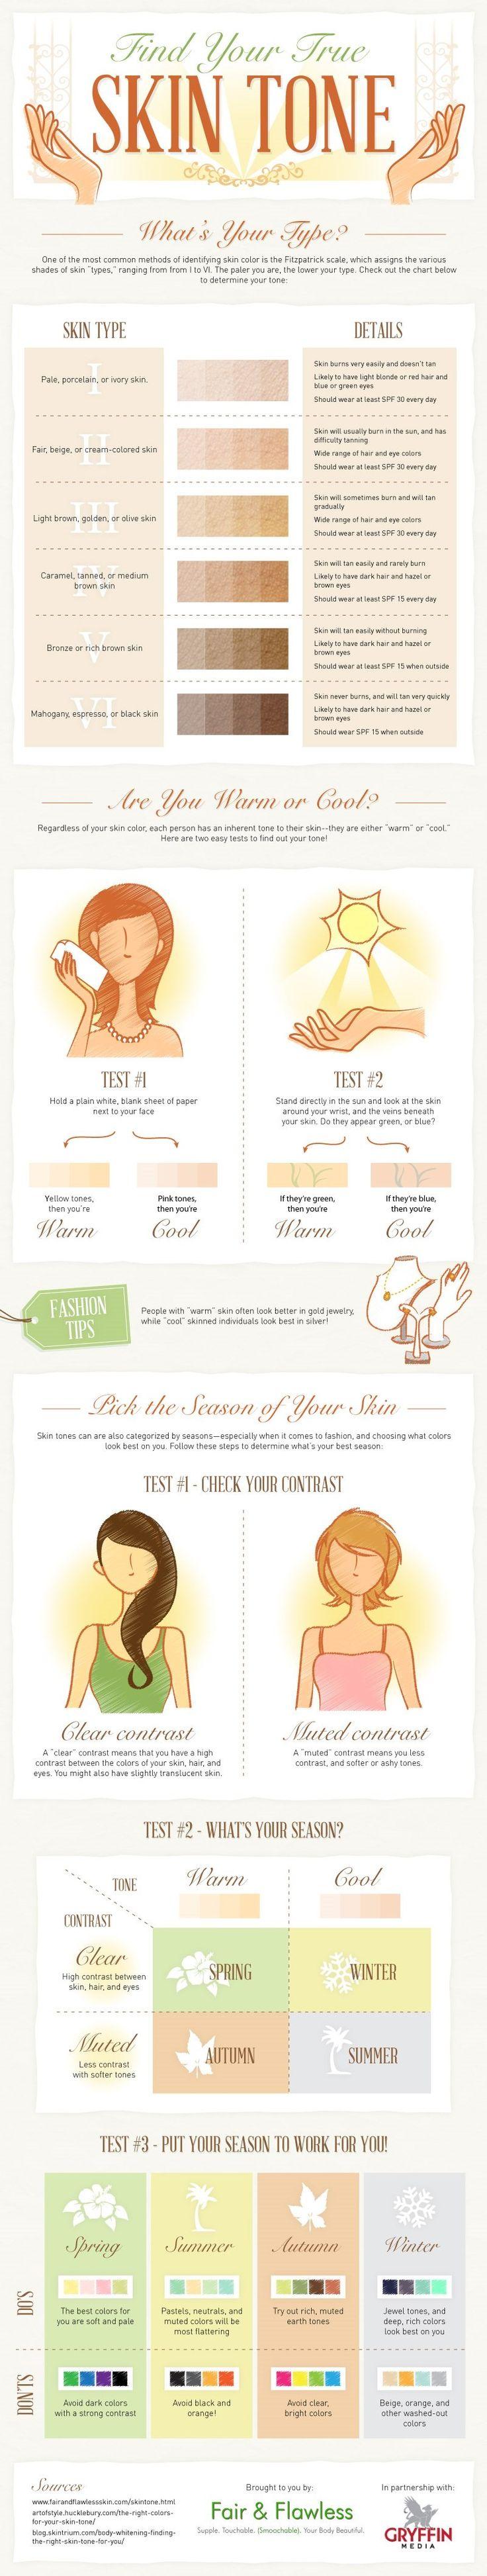 Skin tones truths